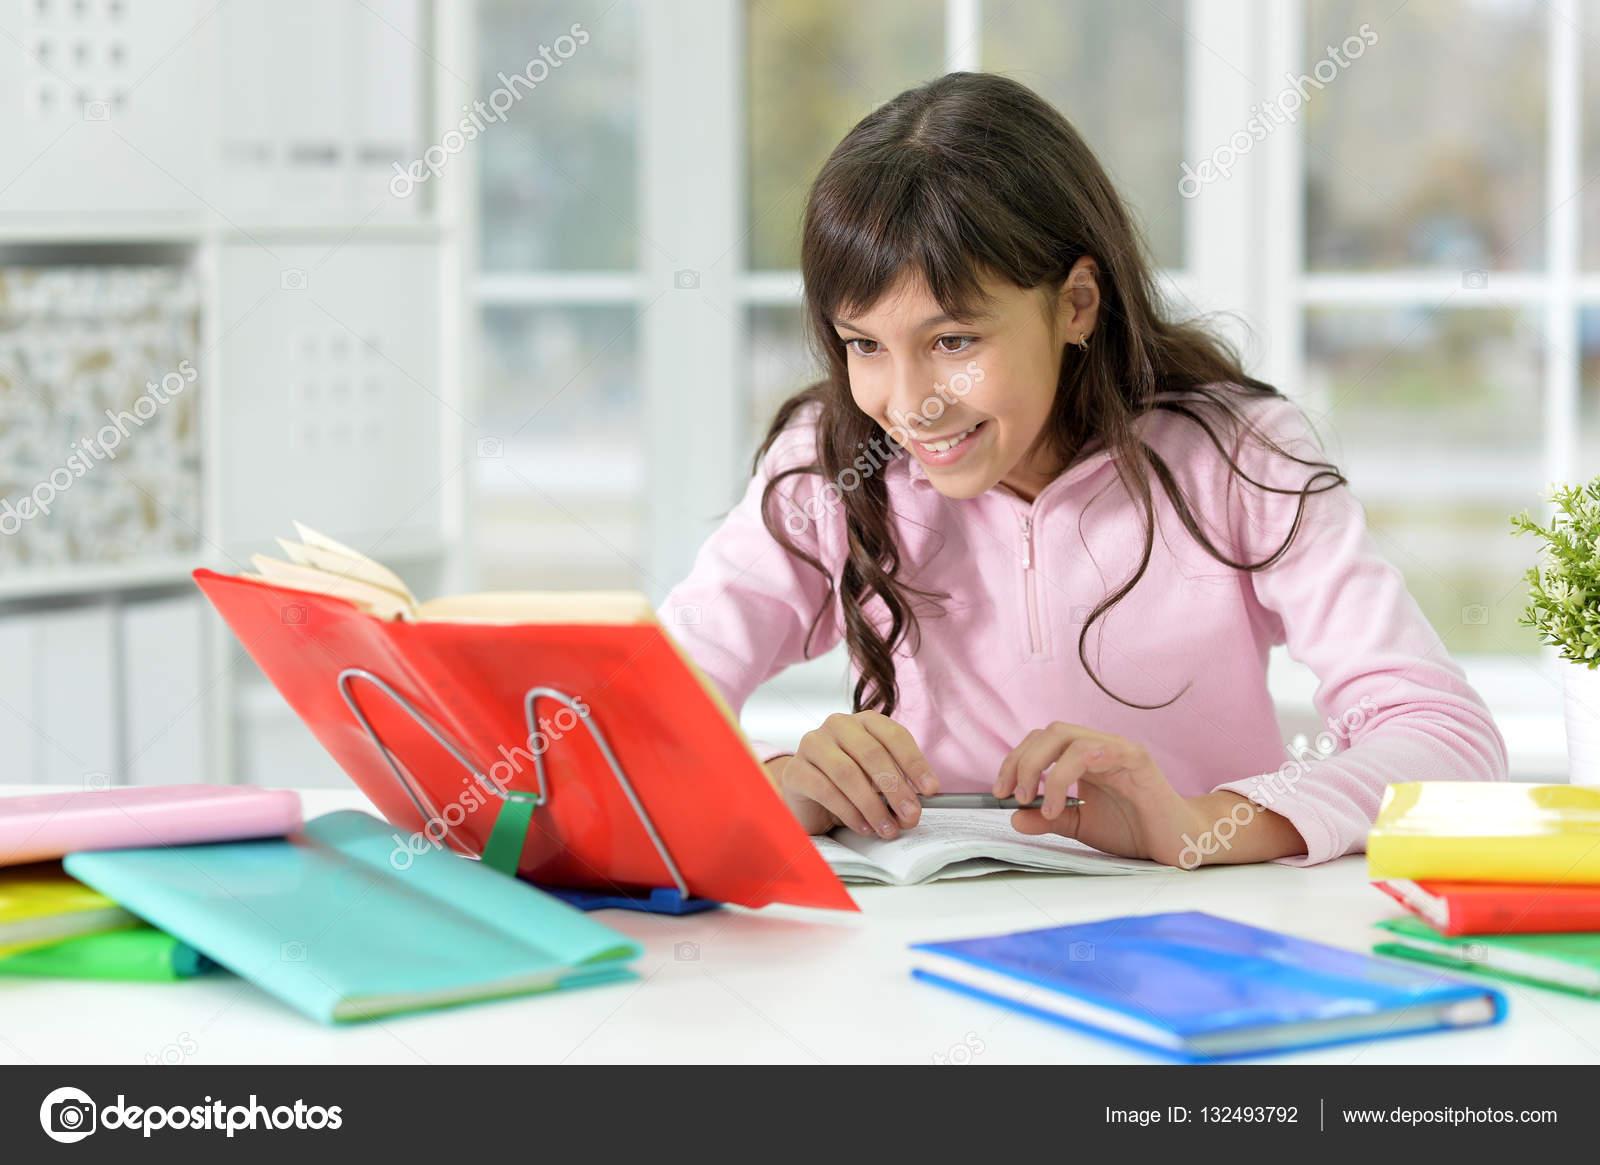 https://st3.depositphotos.com/1080148/13249/i/1600/depositphotos_132493792-stock-photo-girl-doing-homework.jpg